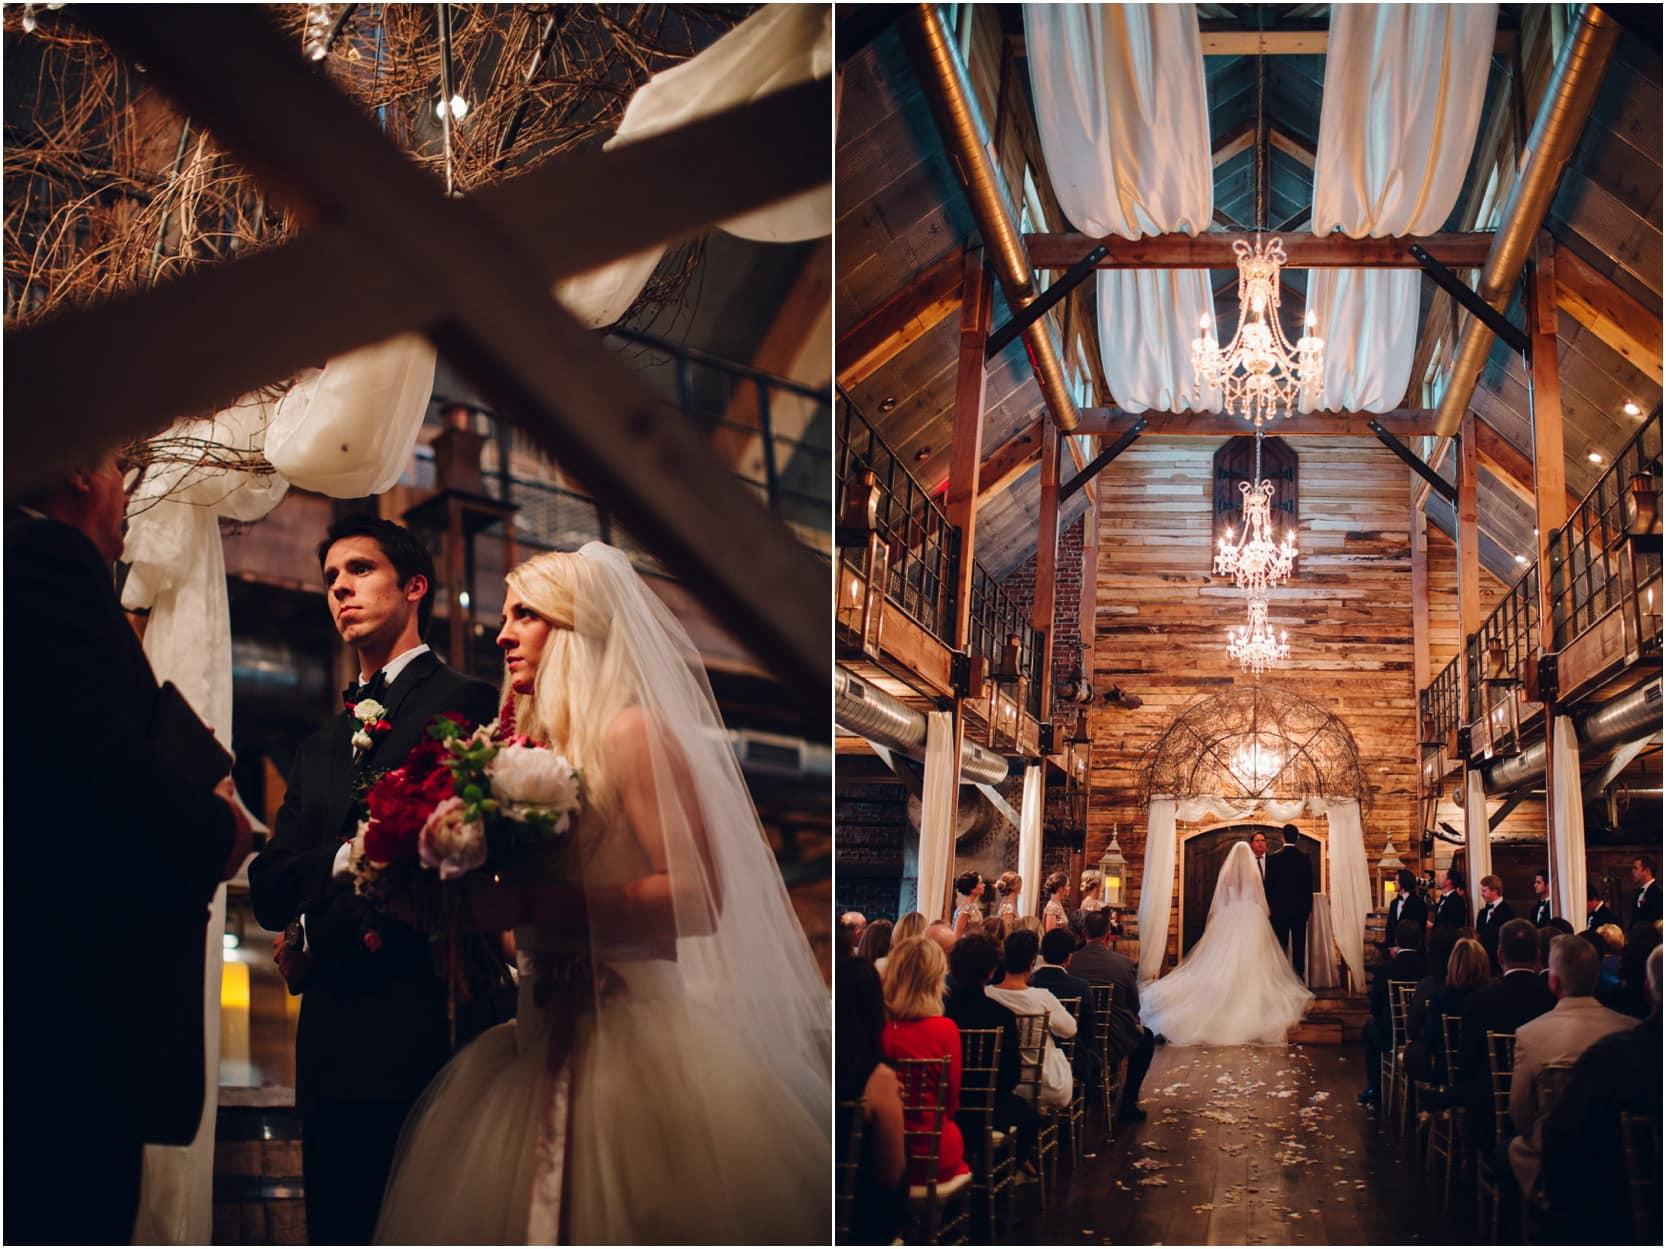 coderhillengburg_oklahoma_wedding__627_blogstomped